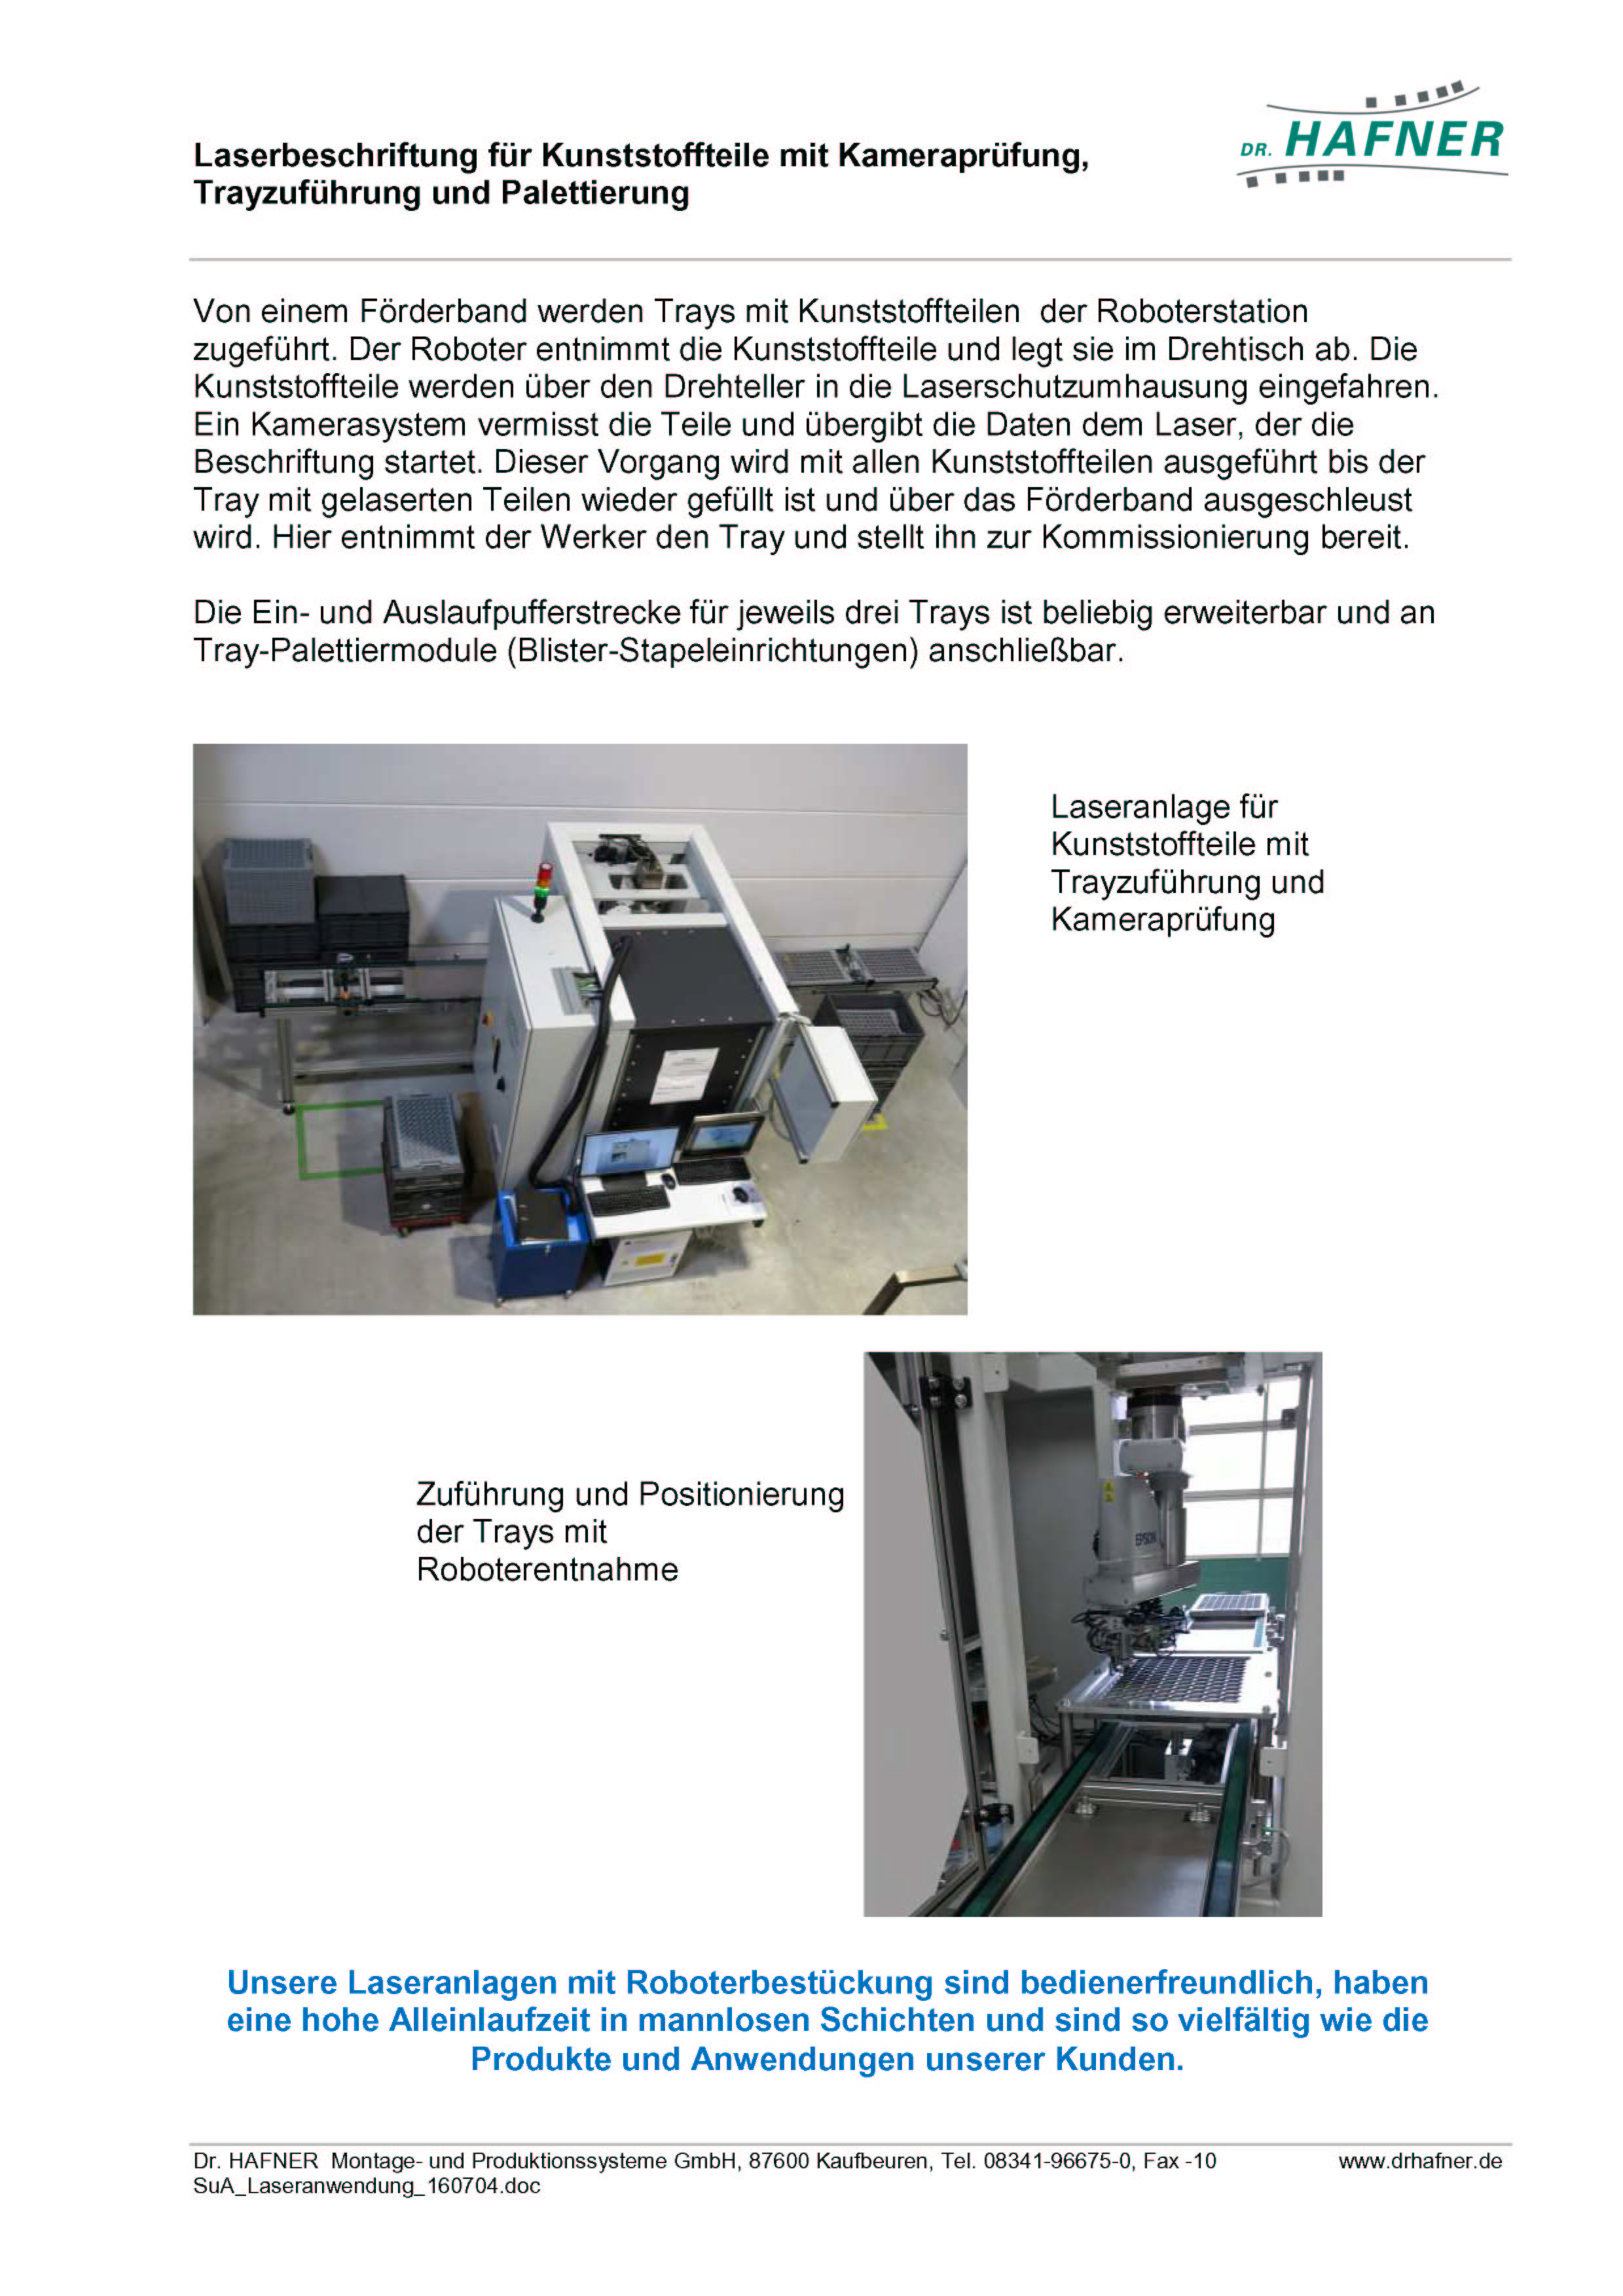 Laserbeschriftung Kunststoffteile Kameraprüfung Trayzuführung